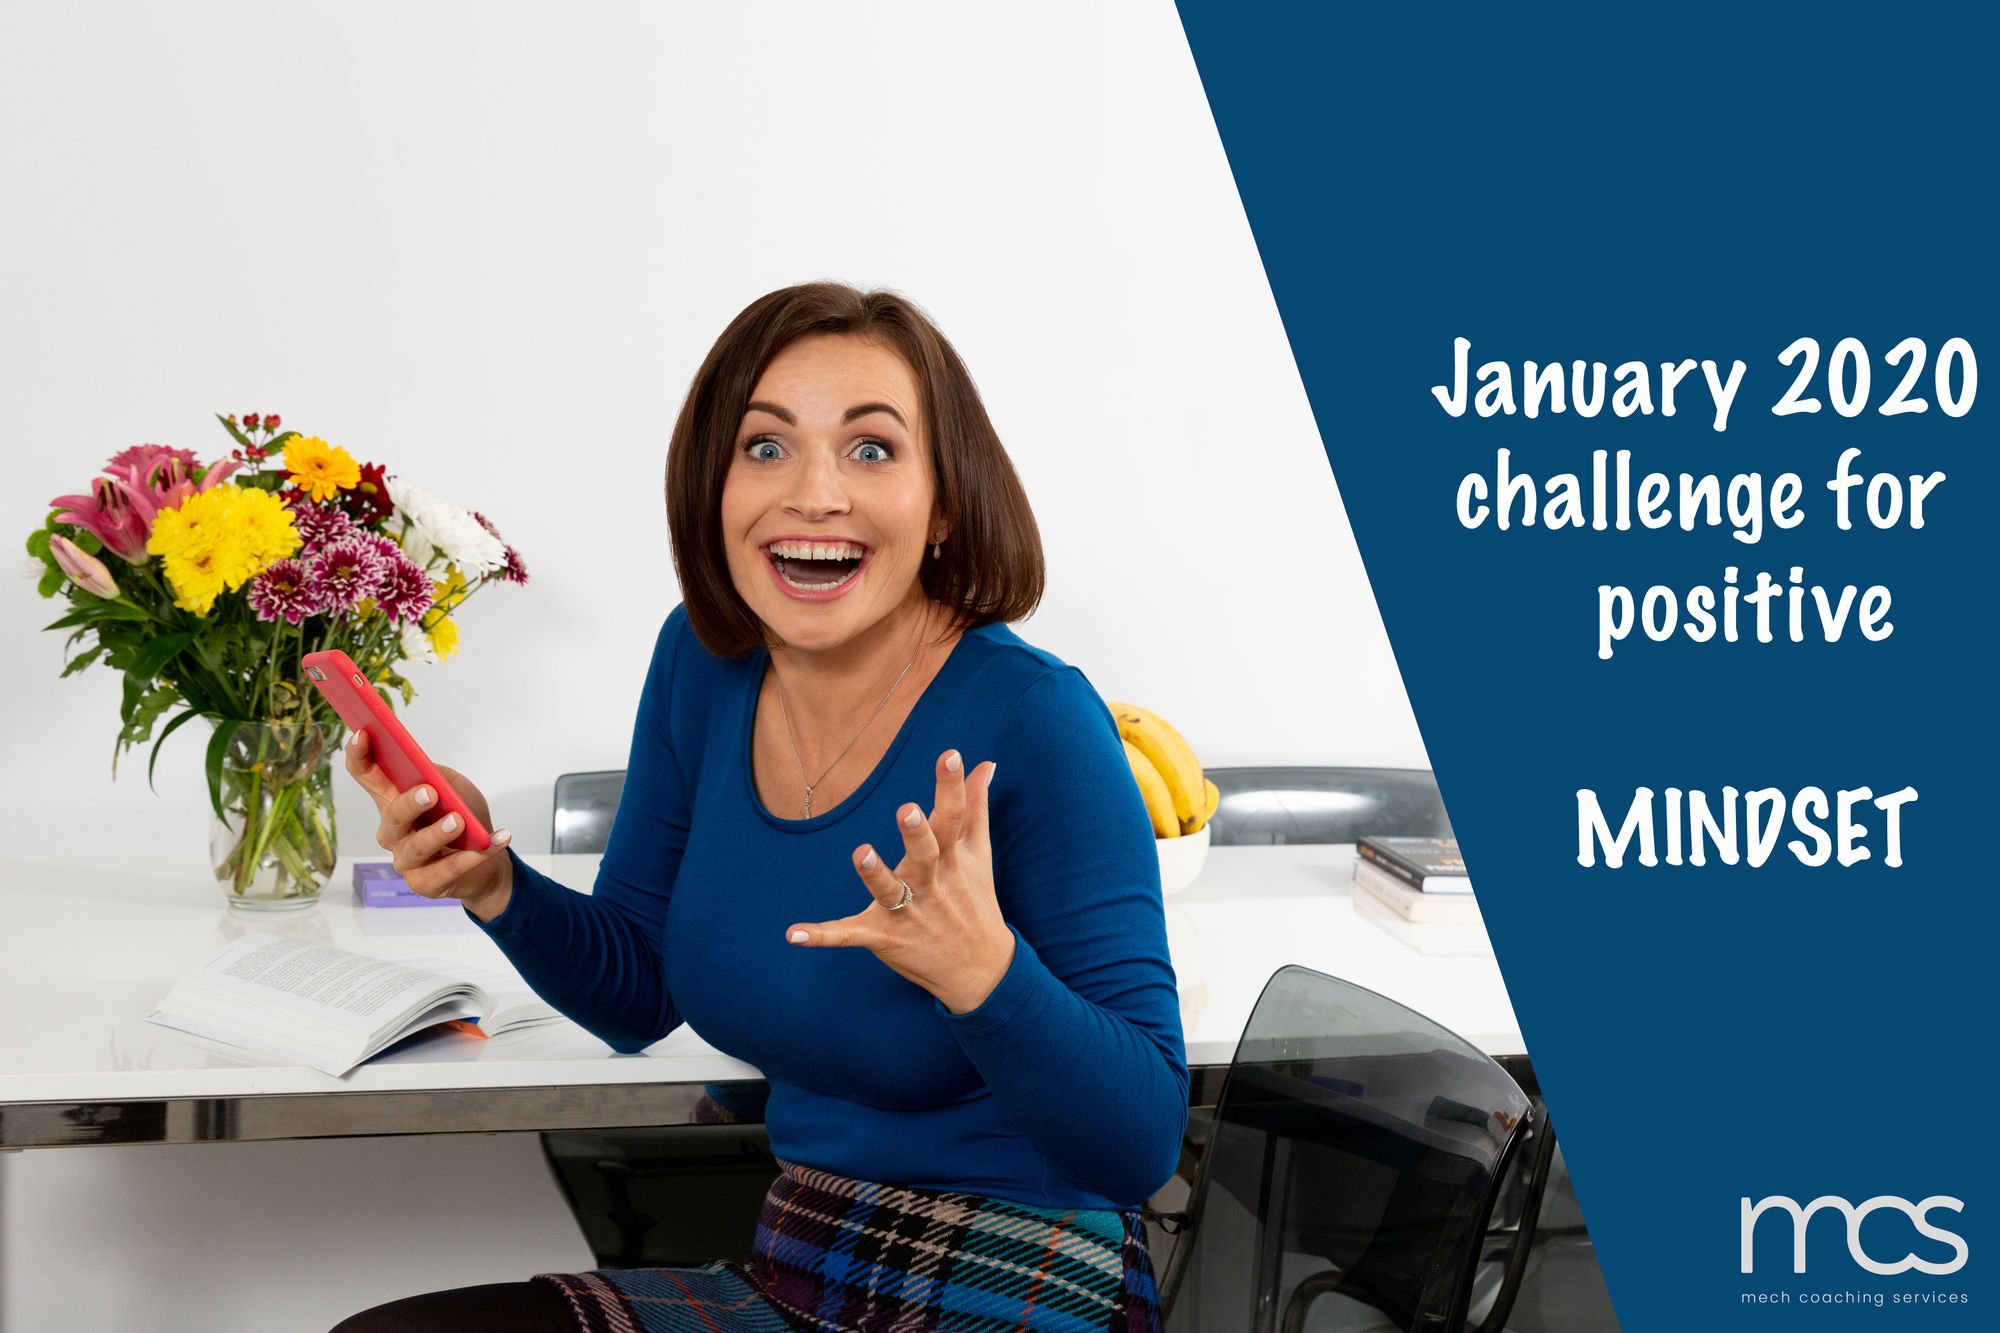 January 2020 challenge for a positive mindset!